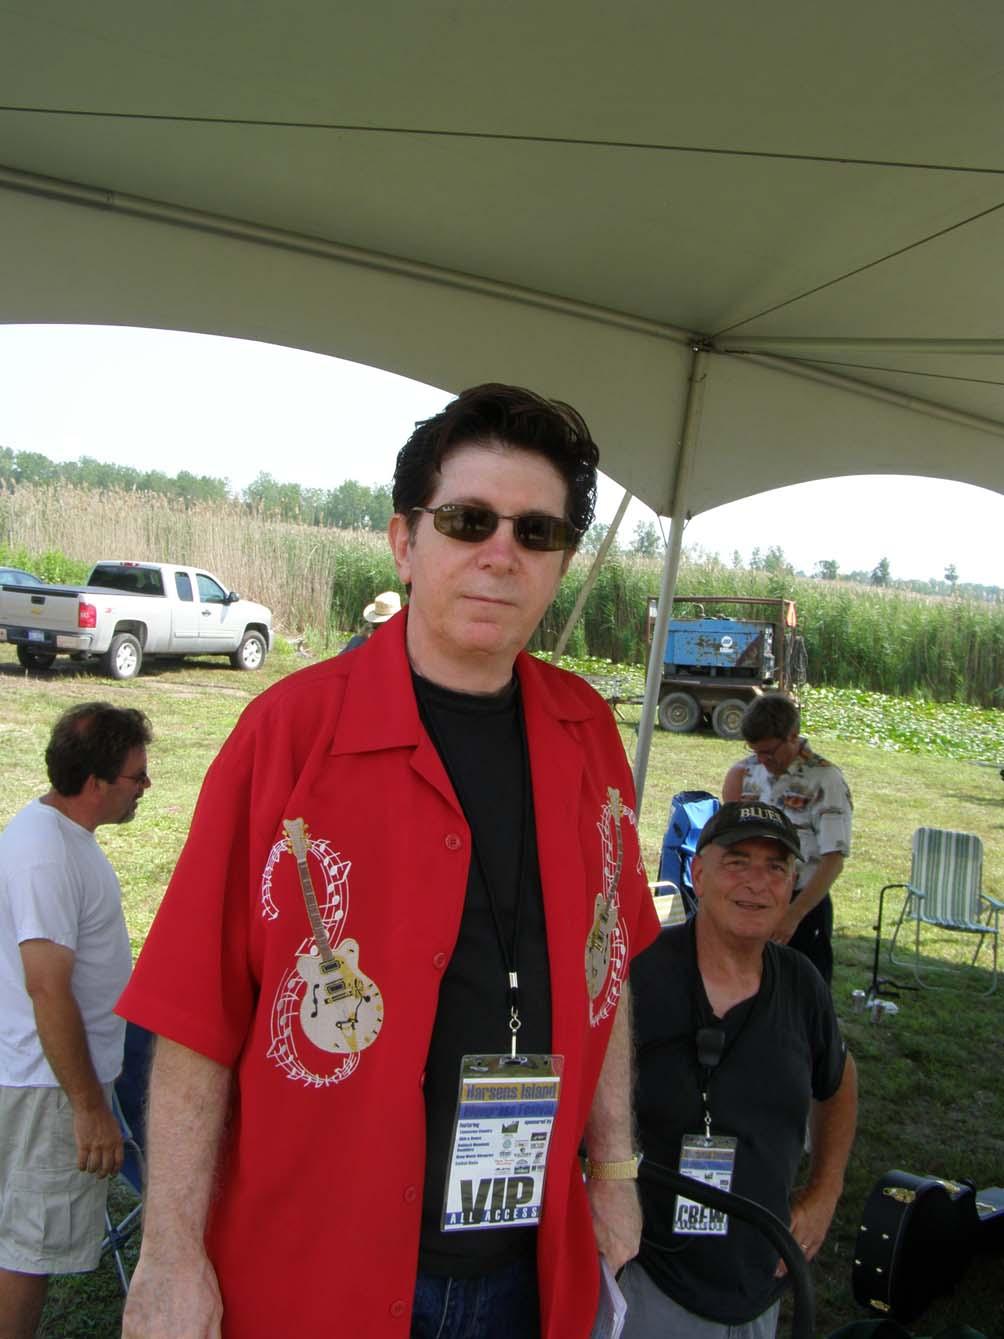 MC Sheldon Kay, the Rock and Roll Lawyer